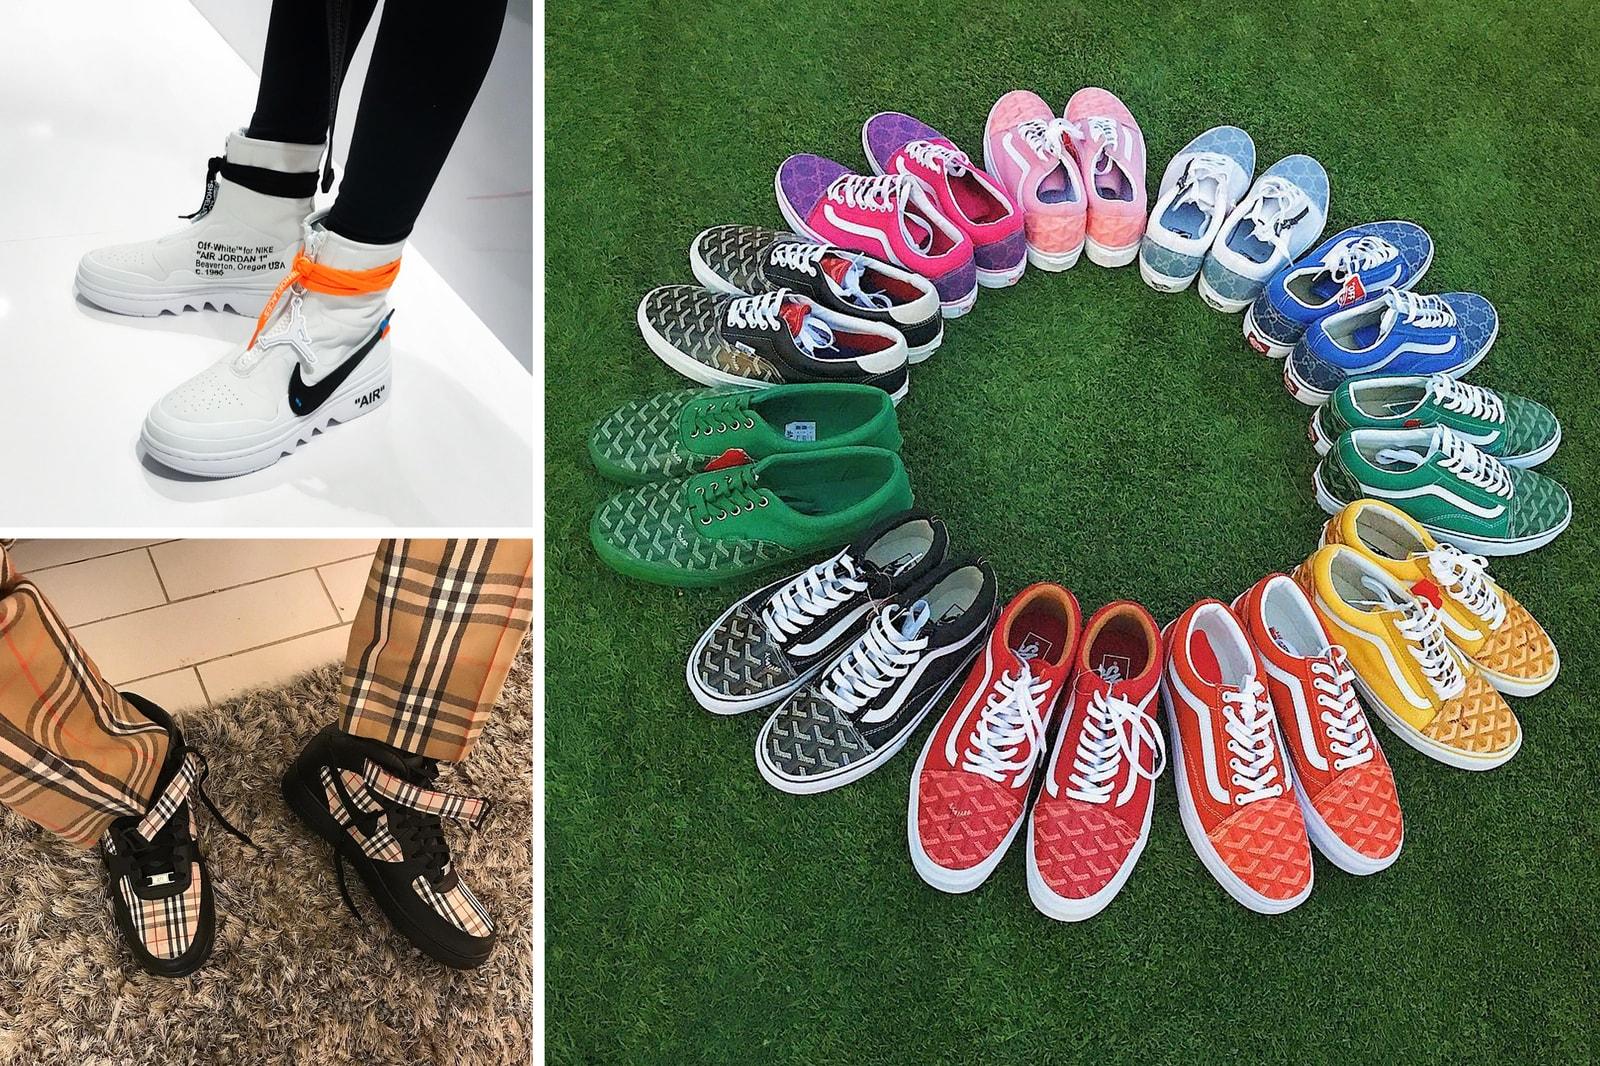 Best Custom Sneaker Instagram Accounts Shoe Surgeon Fre Customs Vandy the Pink VIjz Flanuerz Roller Skates Nike adidas Originals FILA Vans